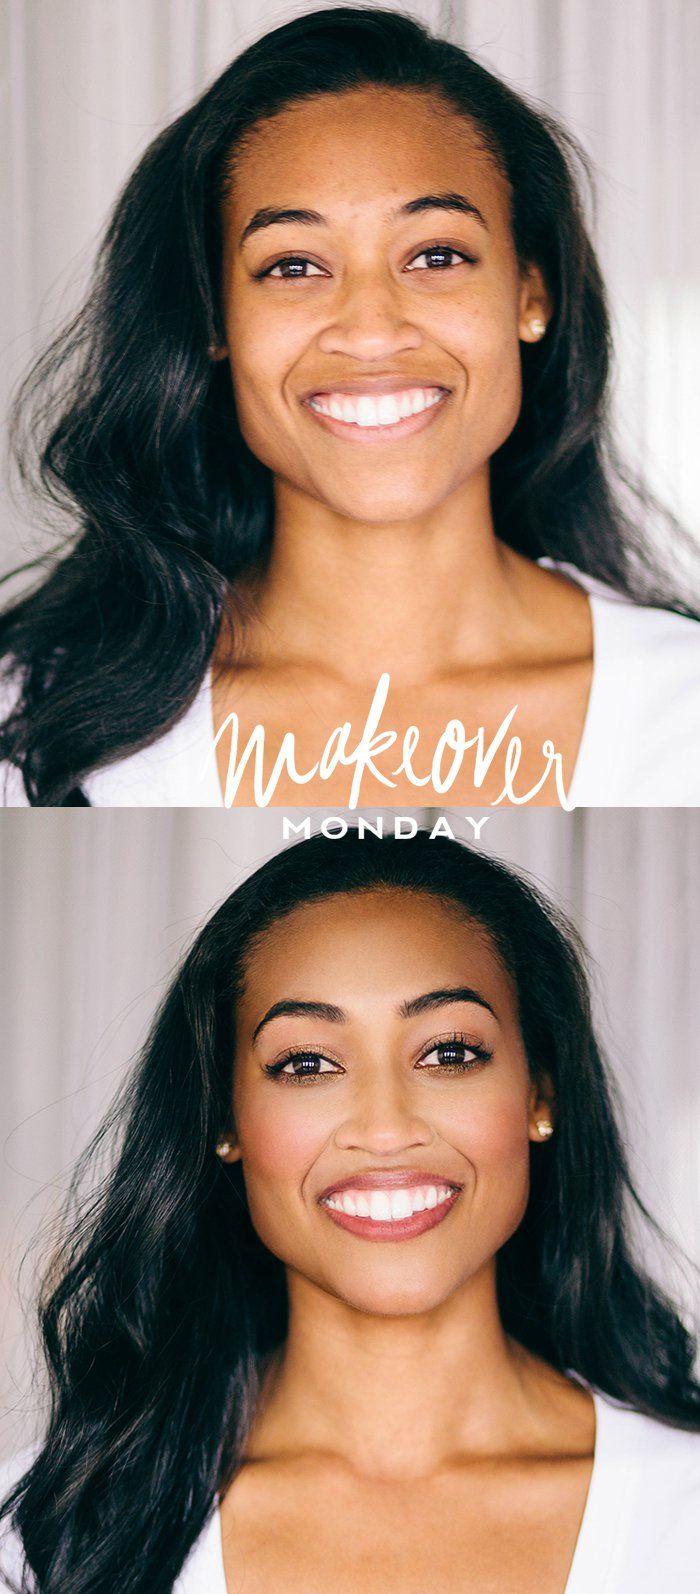 makeover monday – Ali | Maskcara beauty, Beauty makeover